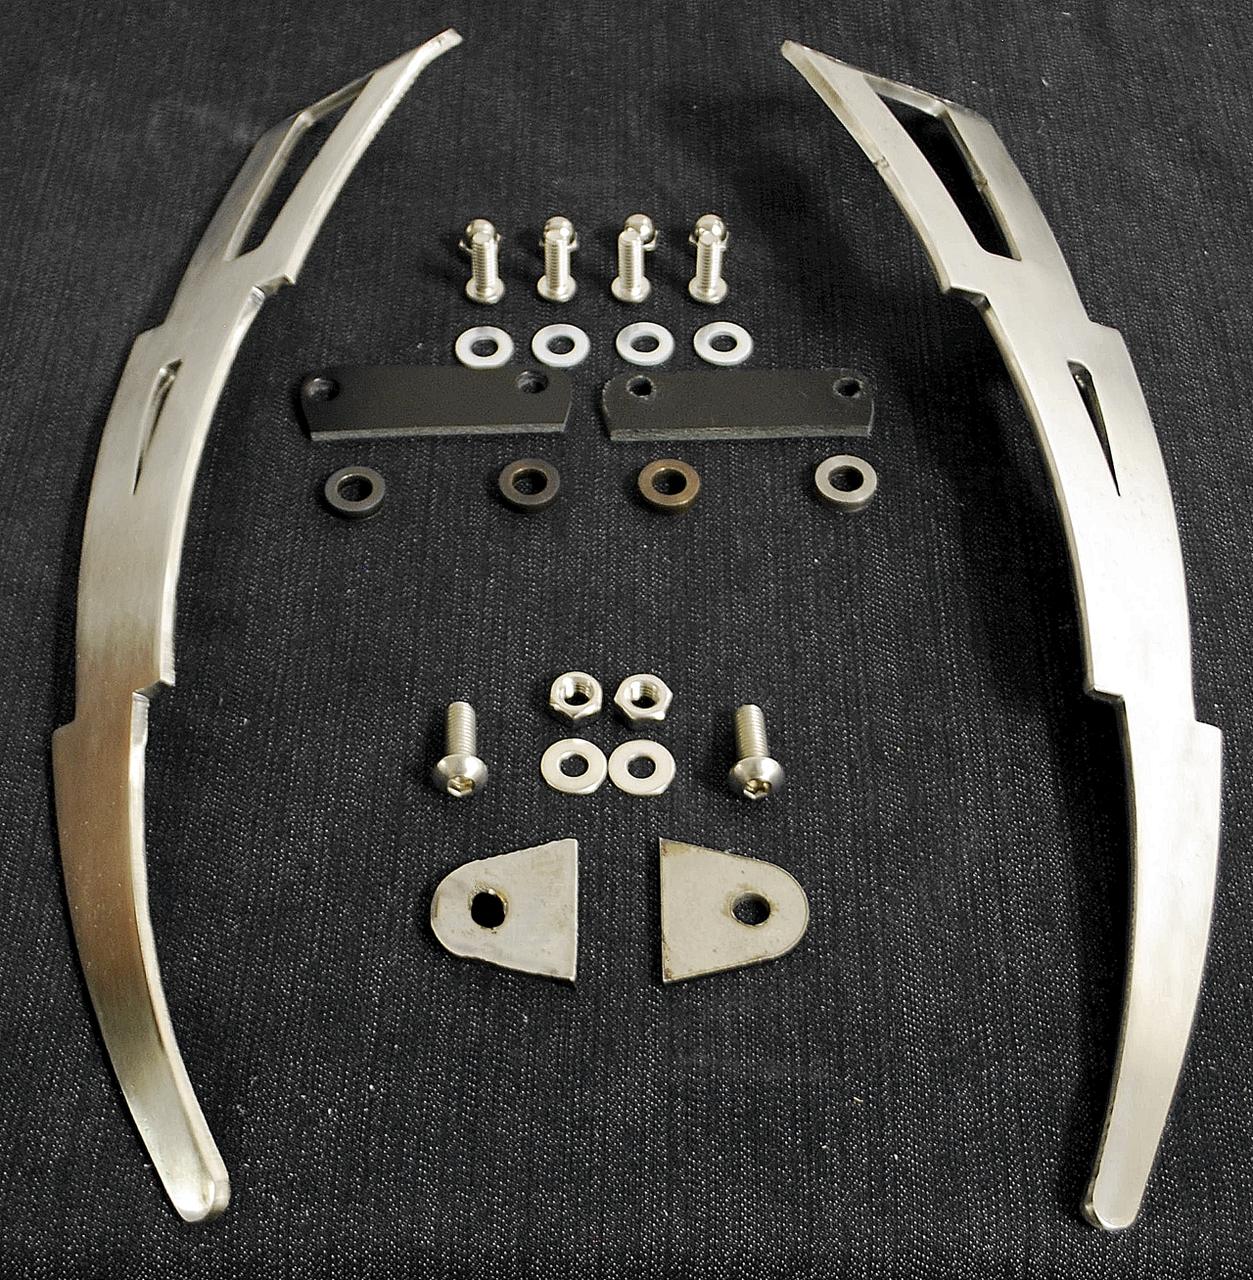 La Rosa Universal Fender Strut Kit - Flash Bolt